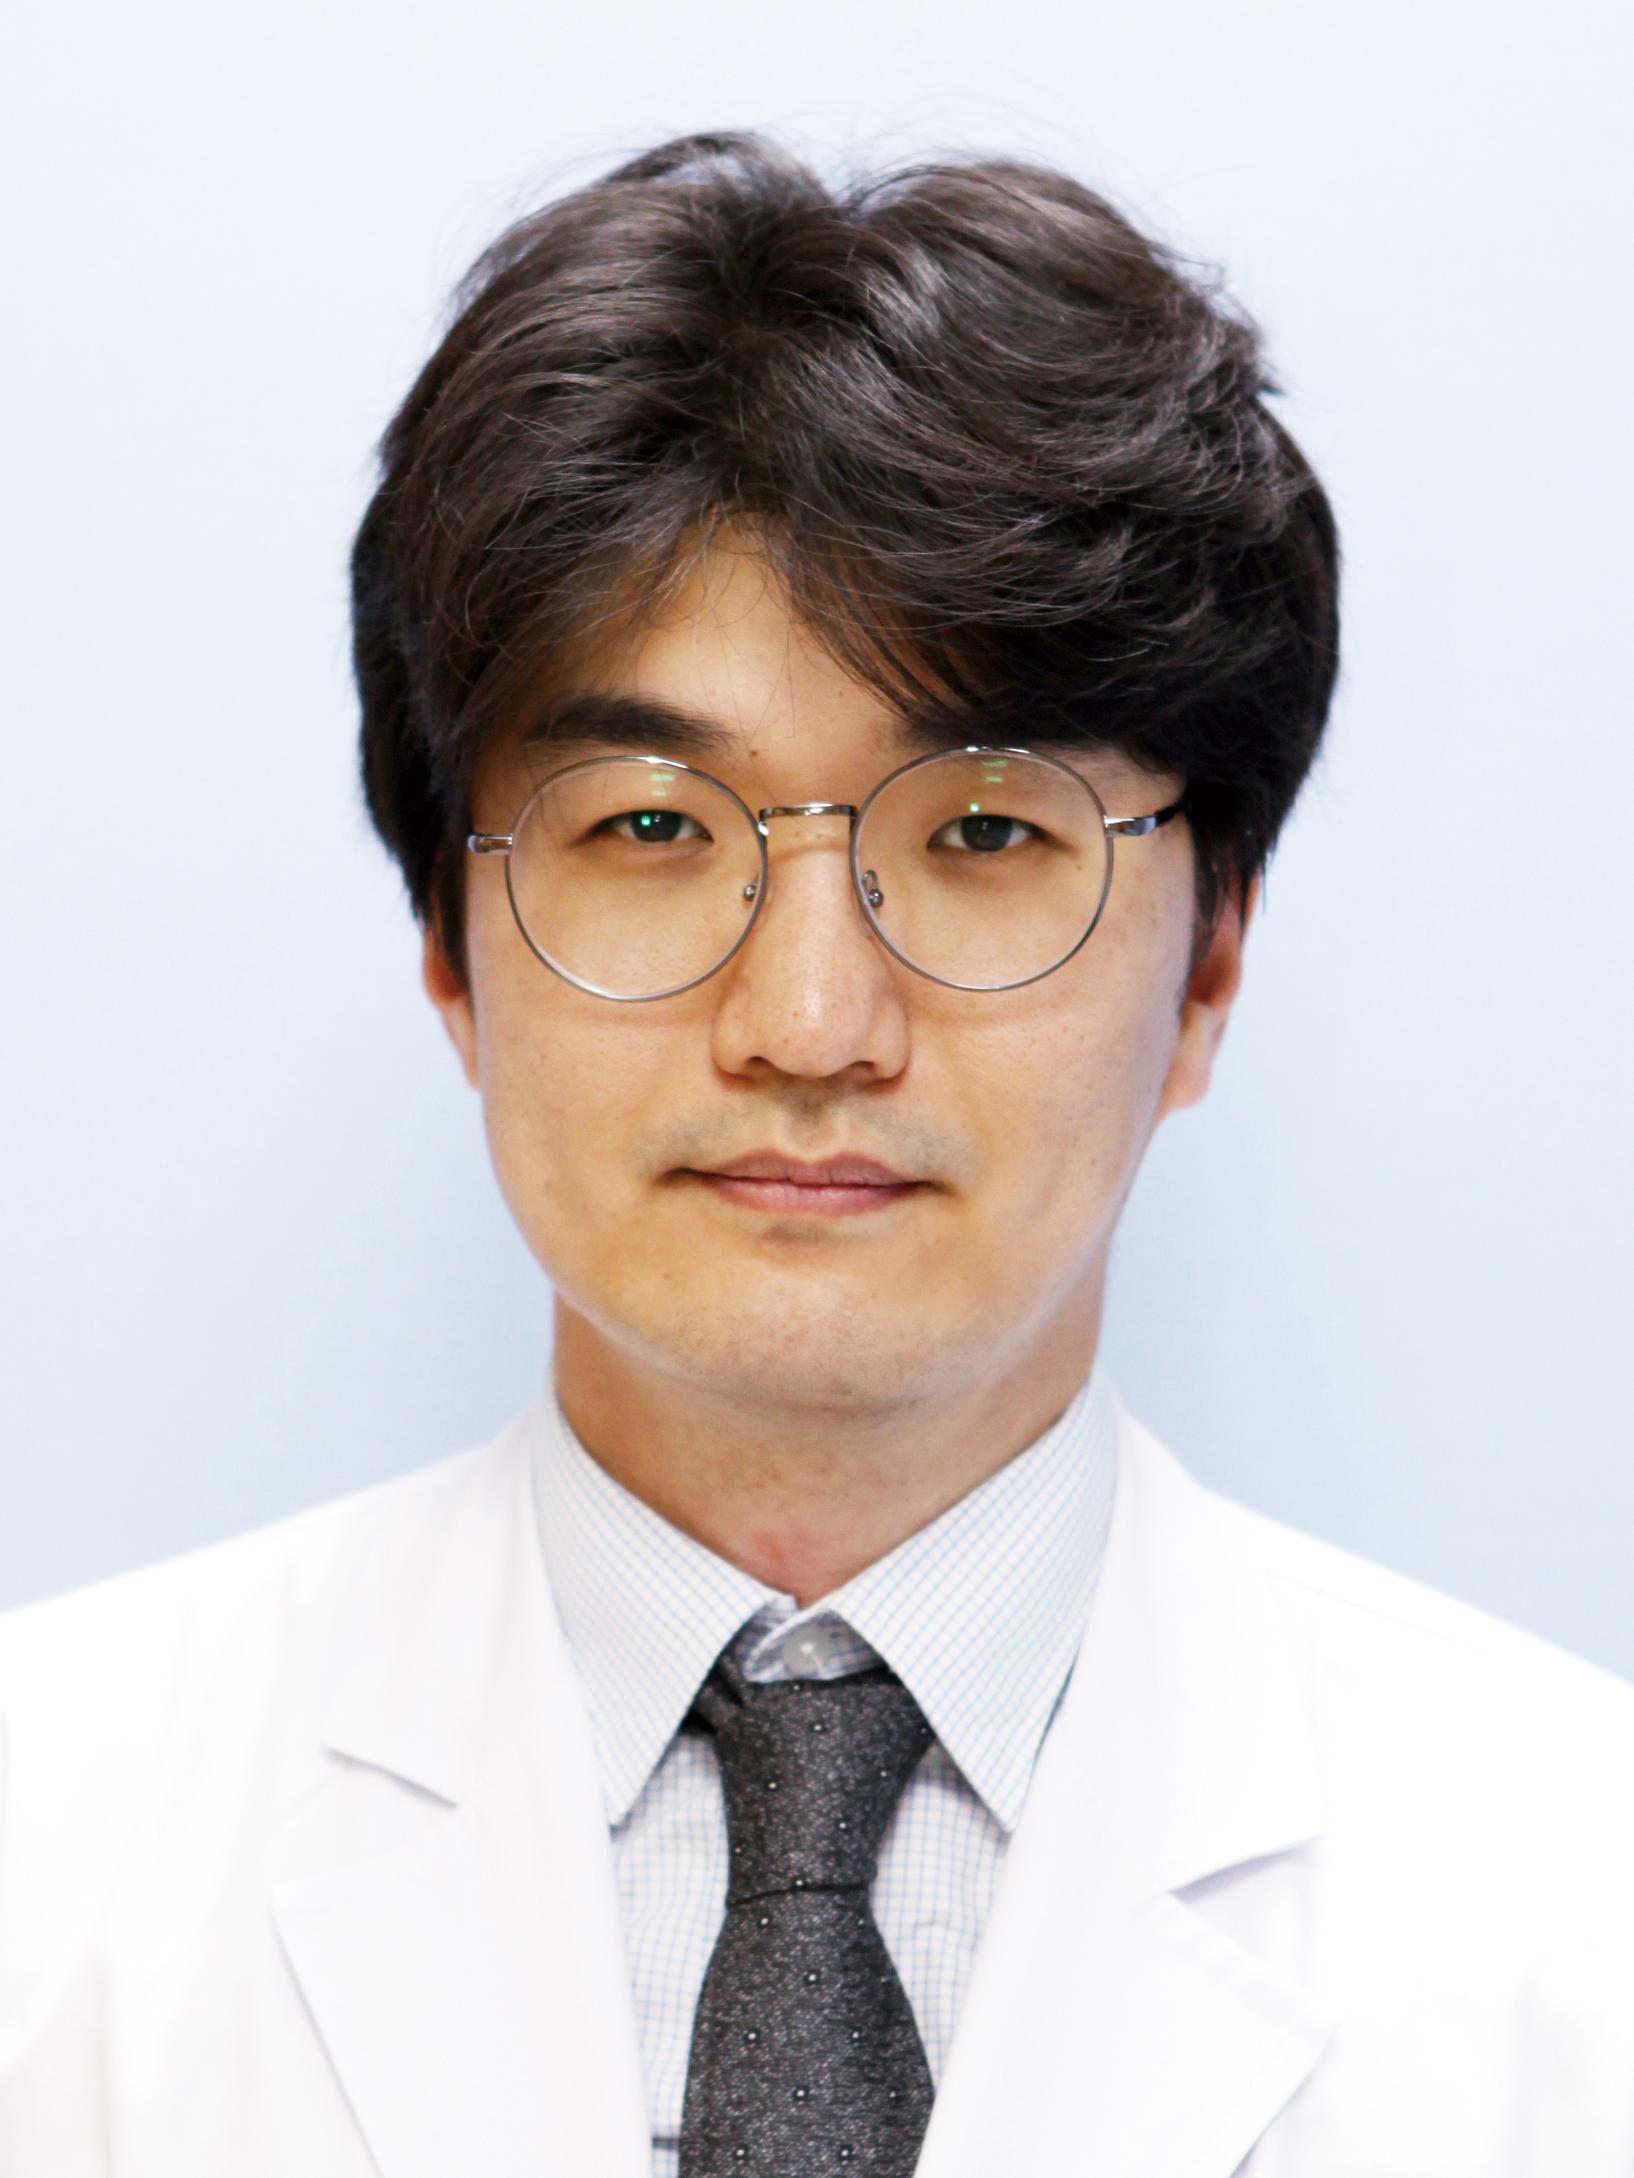 Kim Hee-june 선생님 사진